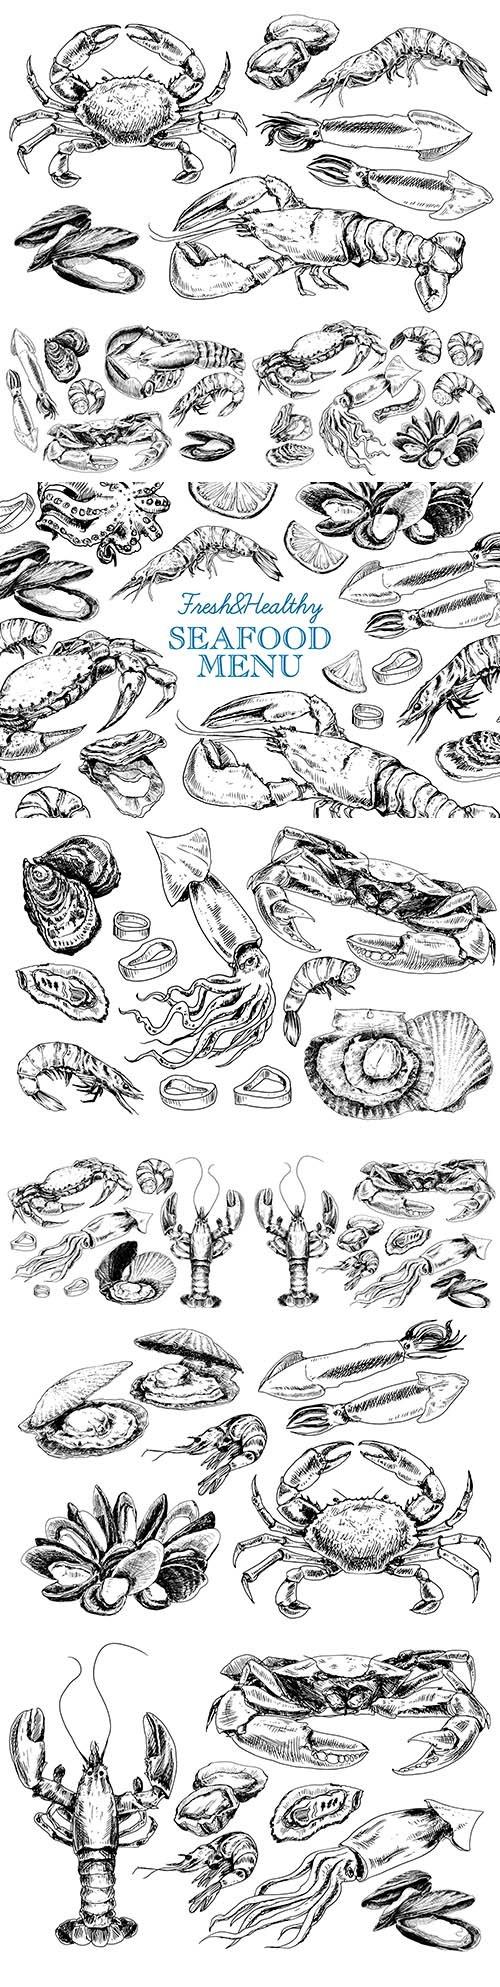 Vintage seafood menu in illustration sketch style